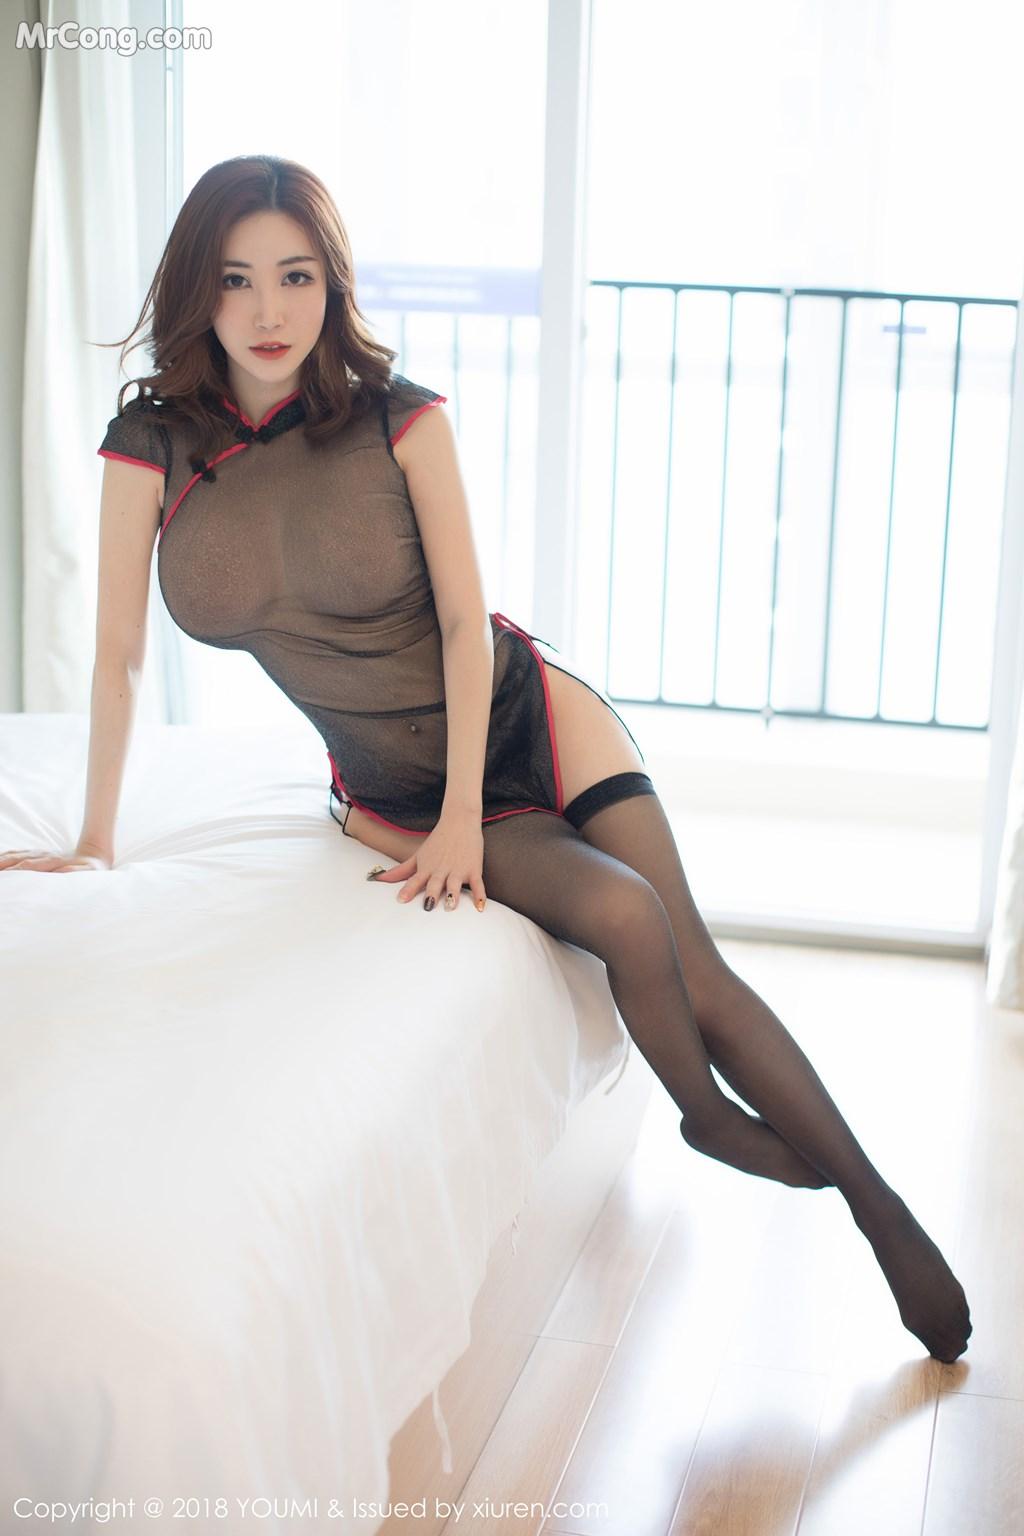 Image YouMi-Vol.236-Sun-Meng-Yao-V-MrCong.com-001 in post YouMi Vol.236: Người mẫu Sun Meng Yao (孙梦瑶V) (47 ảnh)